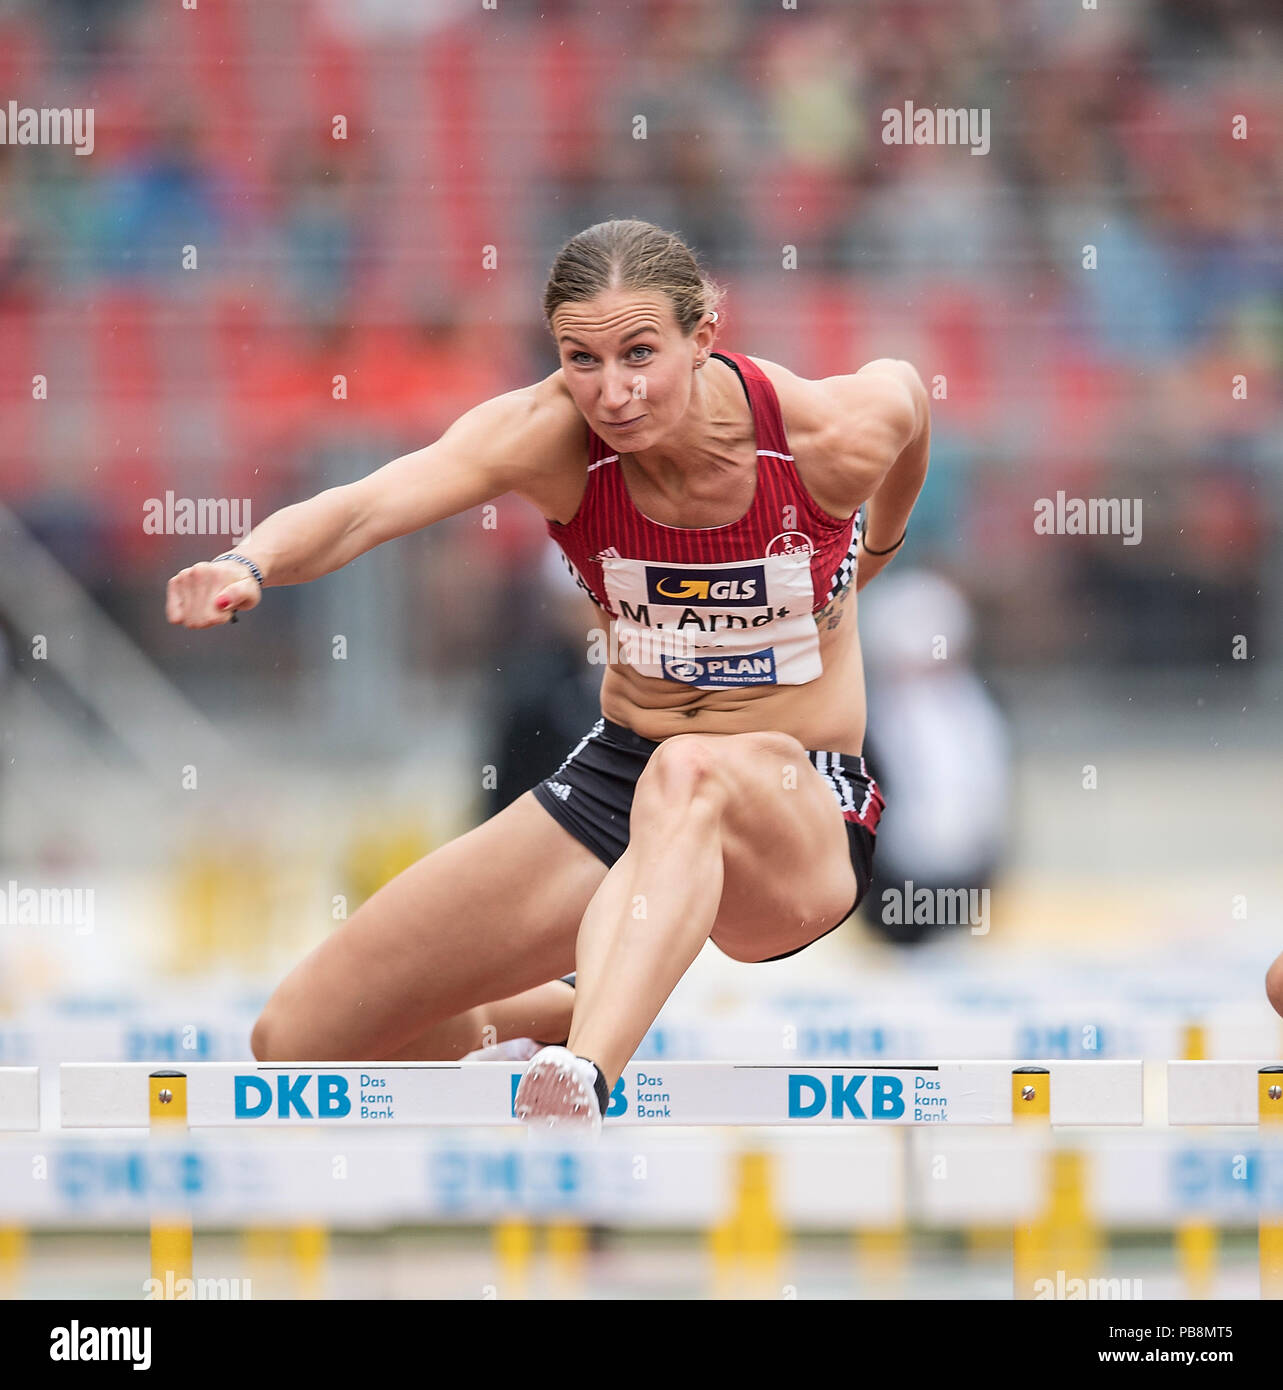 Mareike ARNDT (TSV Bayer 04 Leverkusen) action. Run 100m women's hurdles on 21.07.2018. German Athletics Championships 2018, from 20.07. - 22.07.2018 in Nuernberg/Germany. | usage worldwide - Stock Image